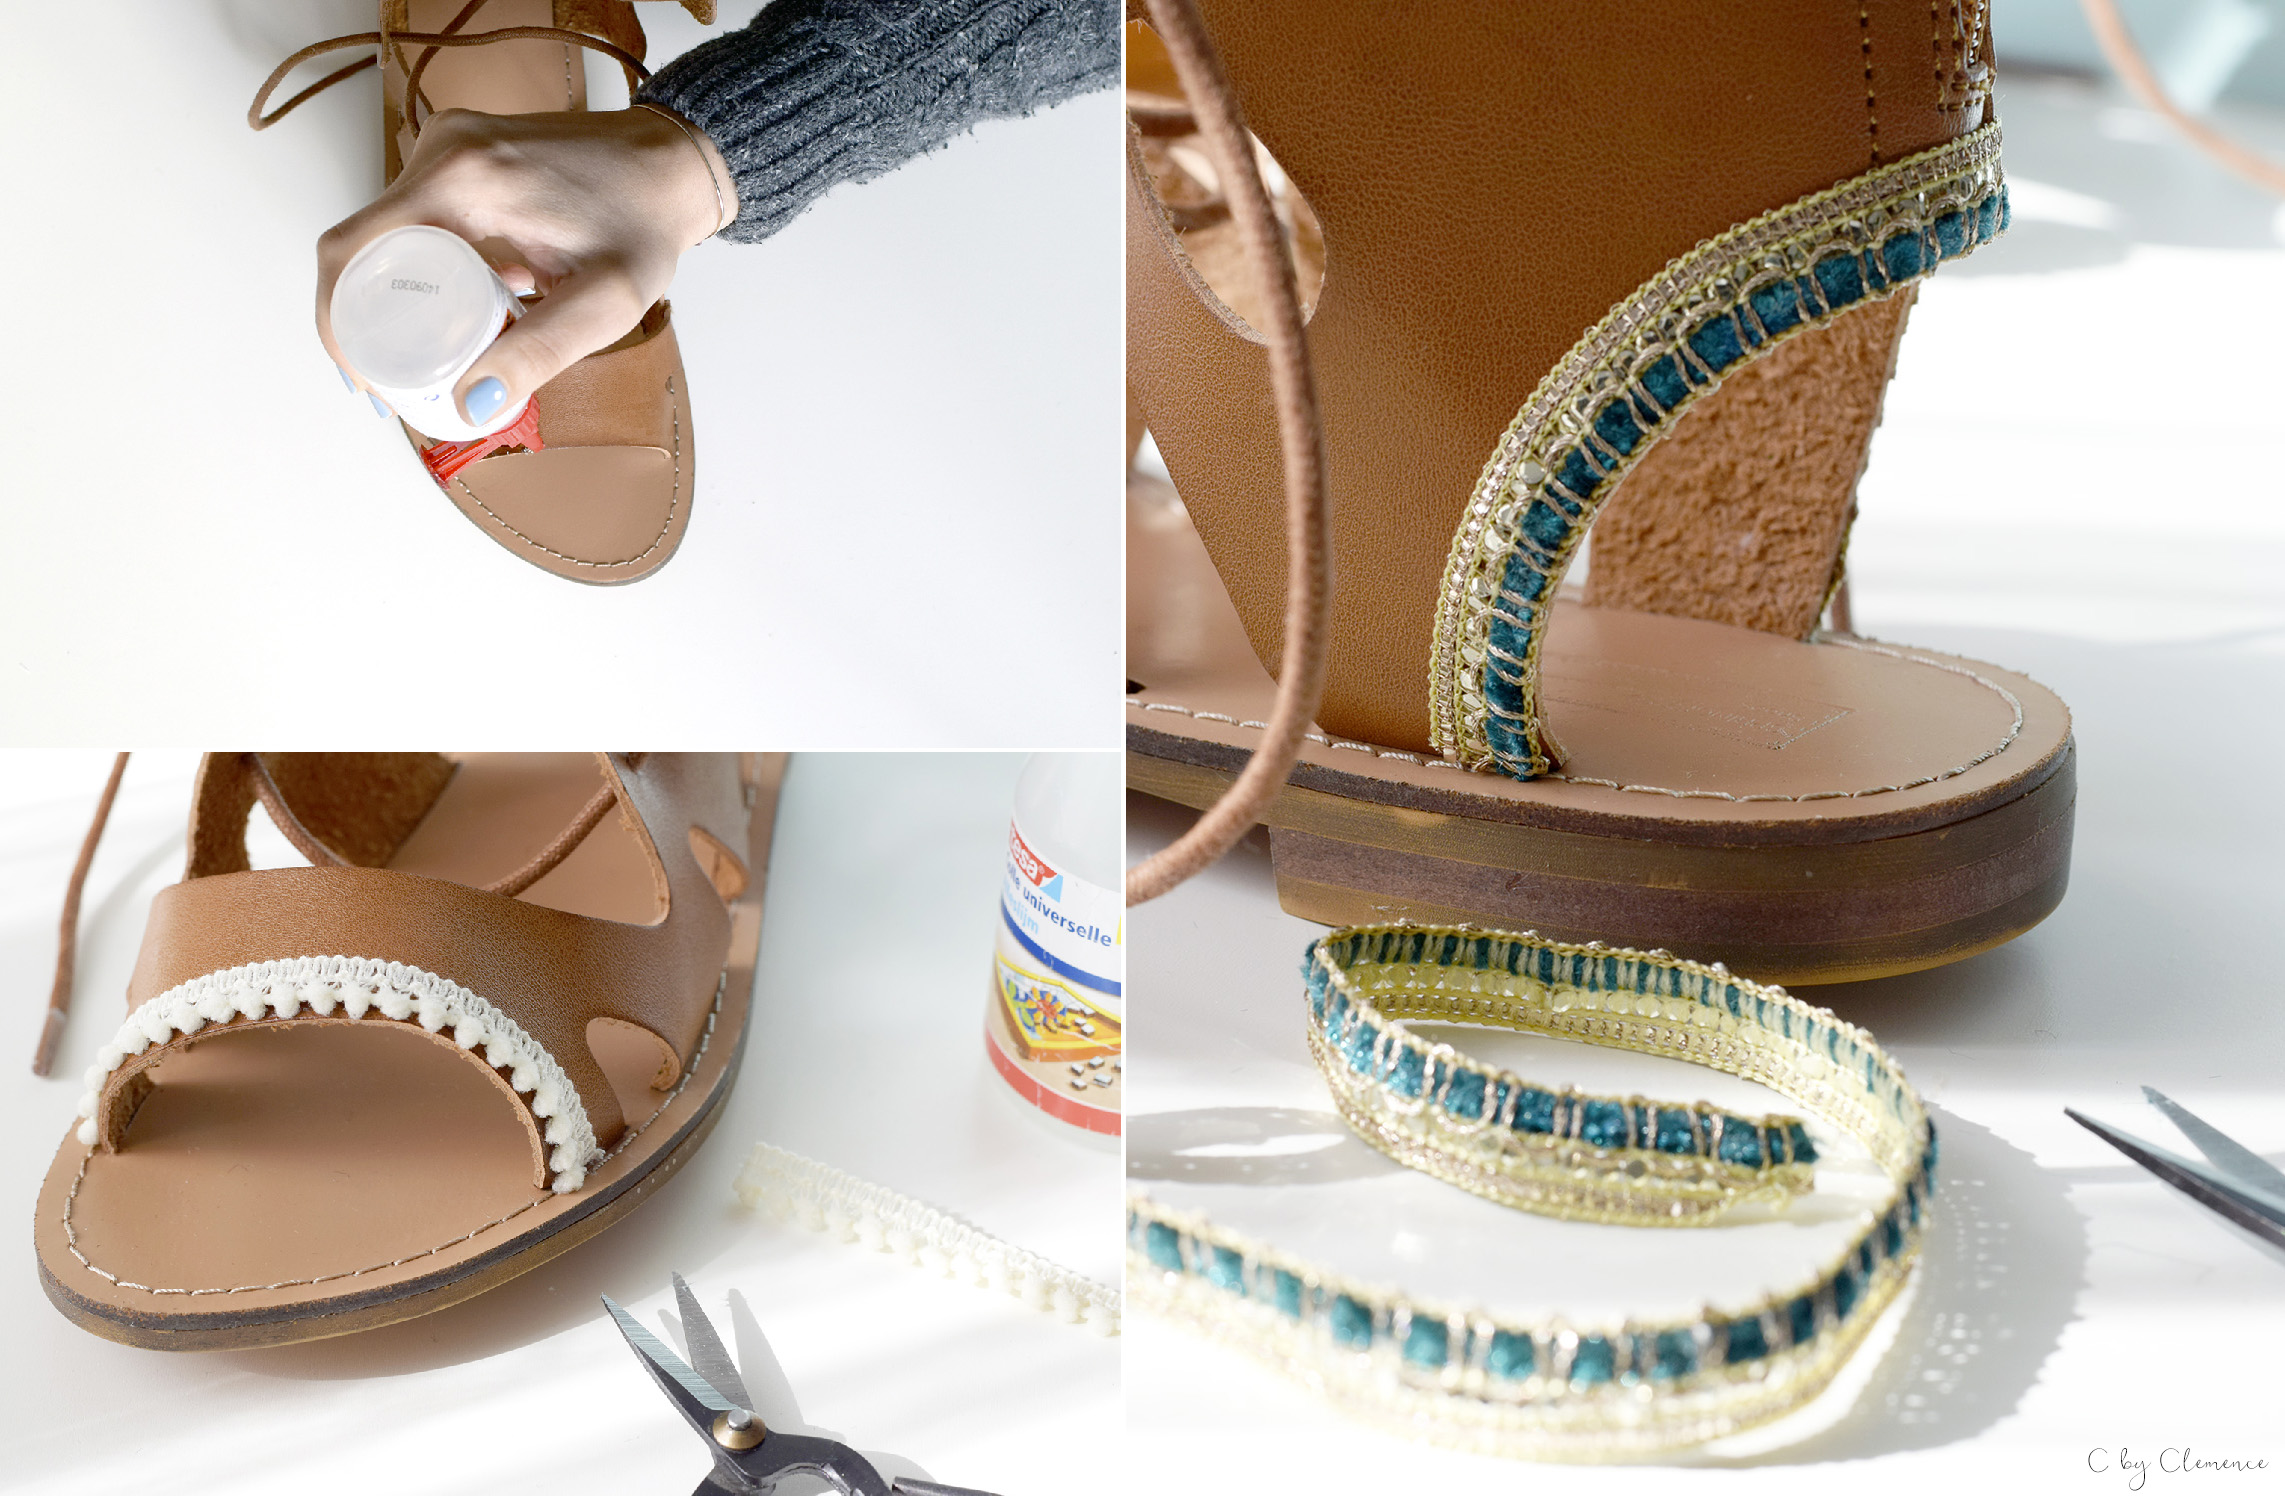 DIY CHAUSSURES BOHO cbyclemence.com 02